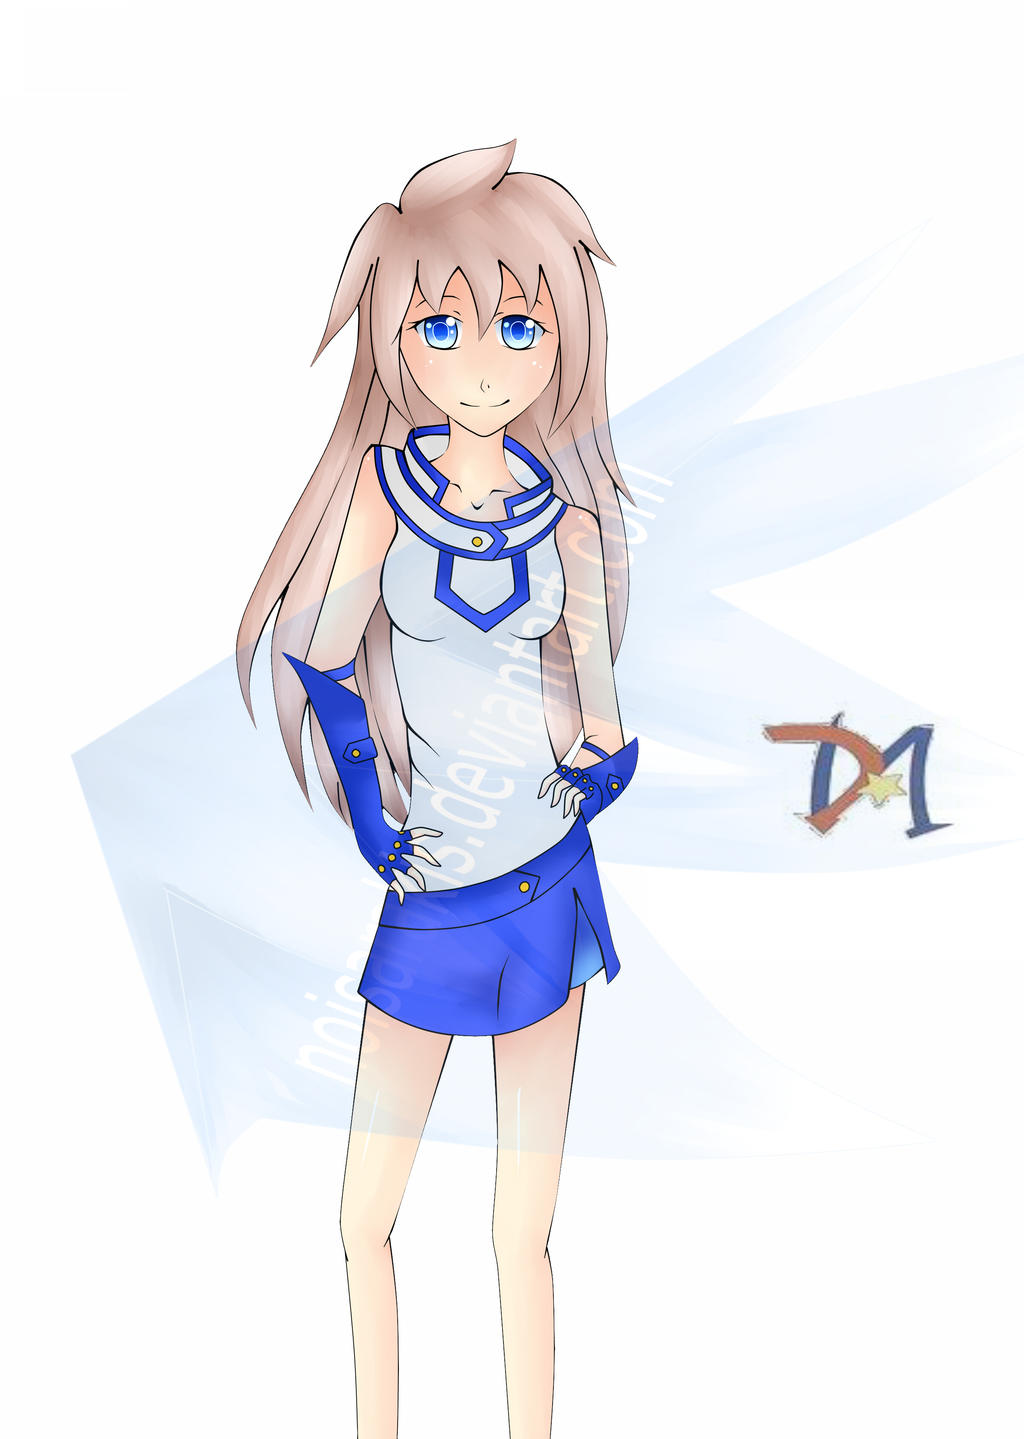 Duel Academia uniform by NoisArakis